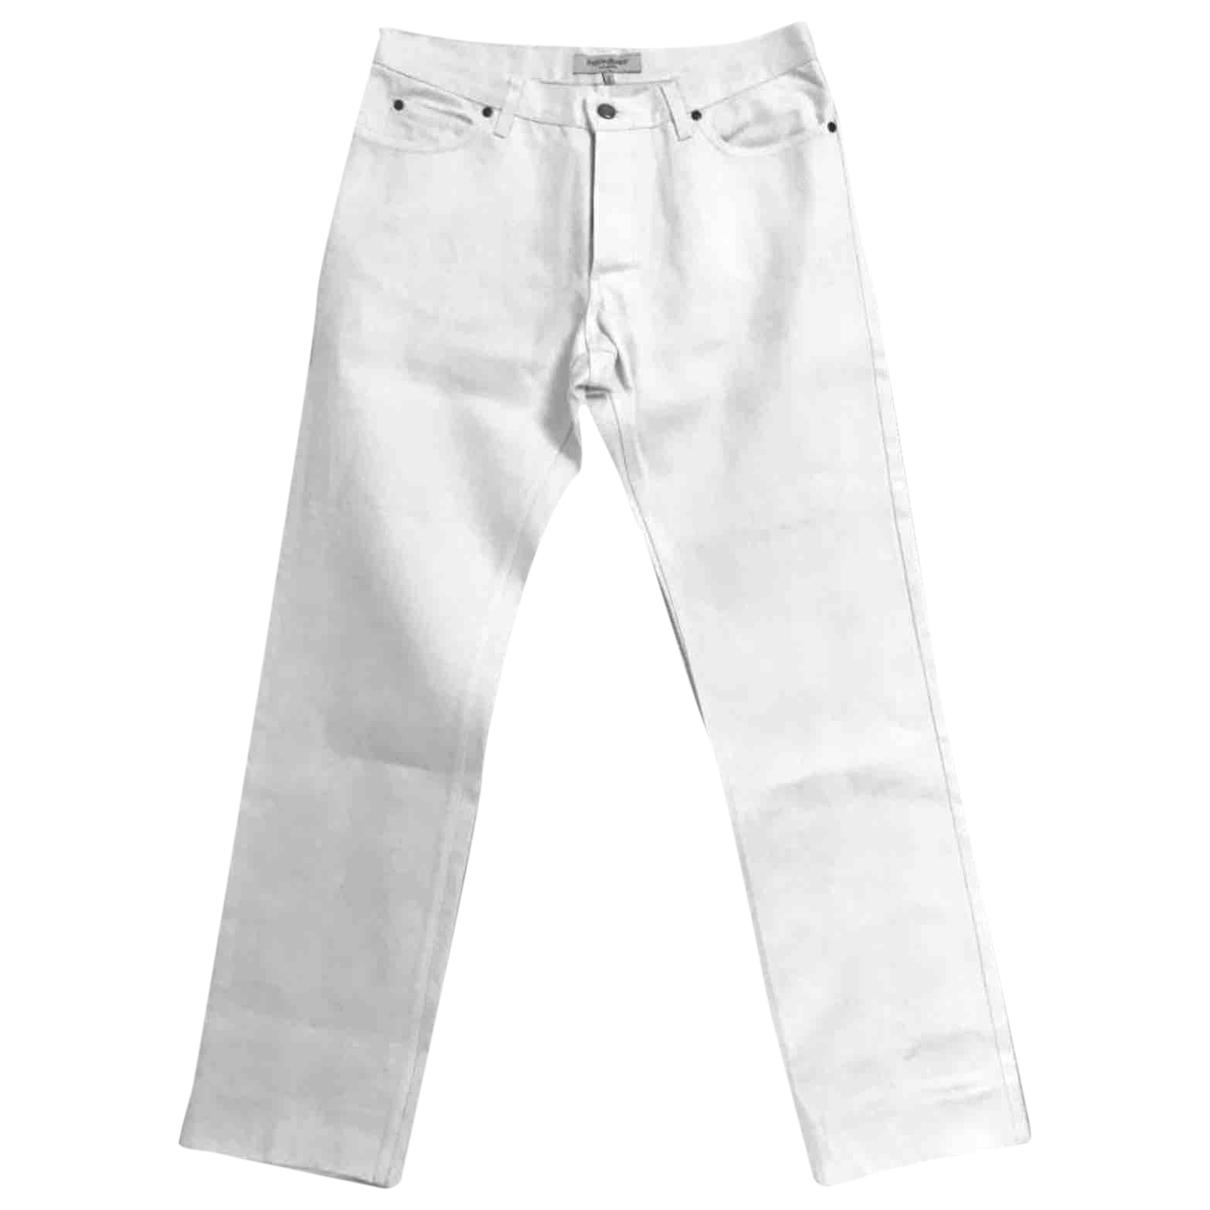 Yves Saint Laurent \N White Cotton Trousers for Men 50 IT